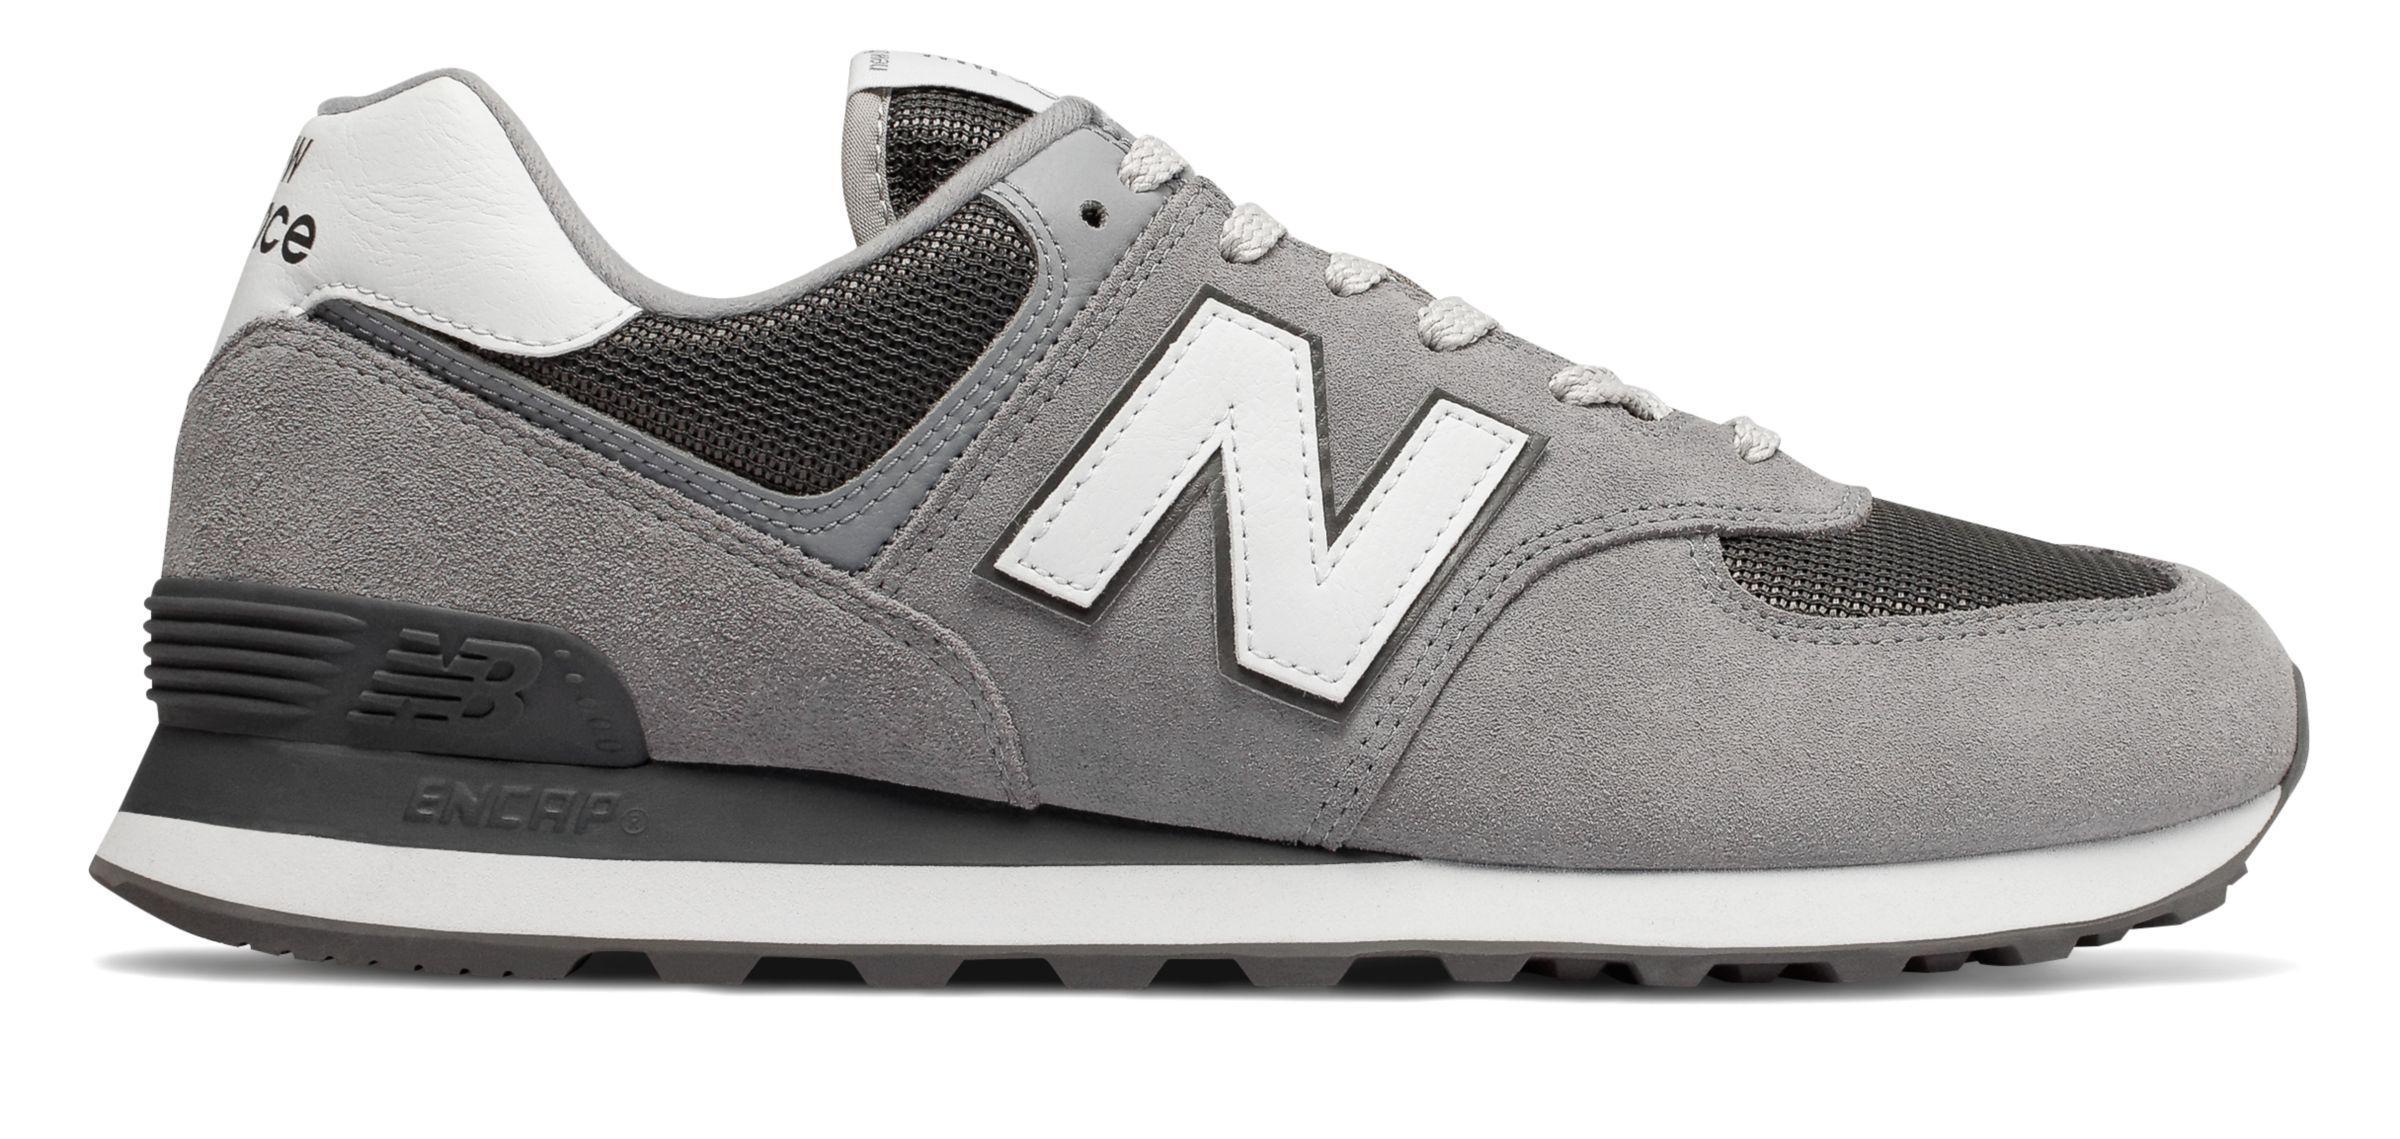 reputable site 6705d 3594c Men's Gray New Balance 574 Shoes